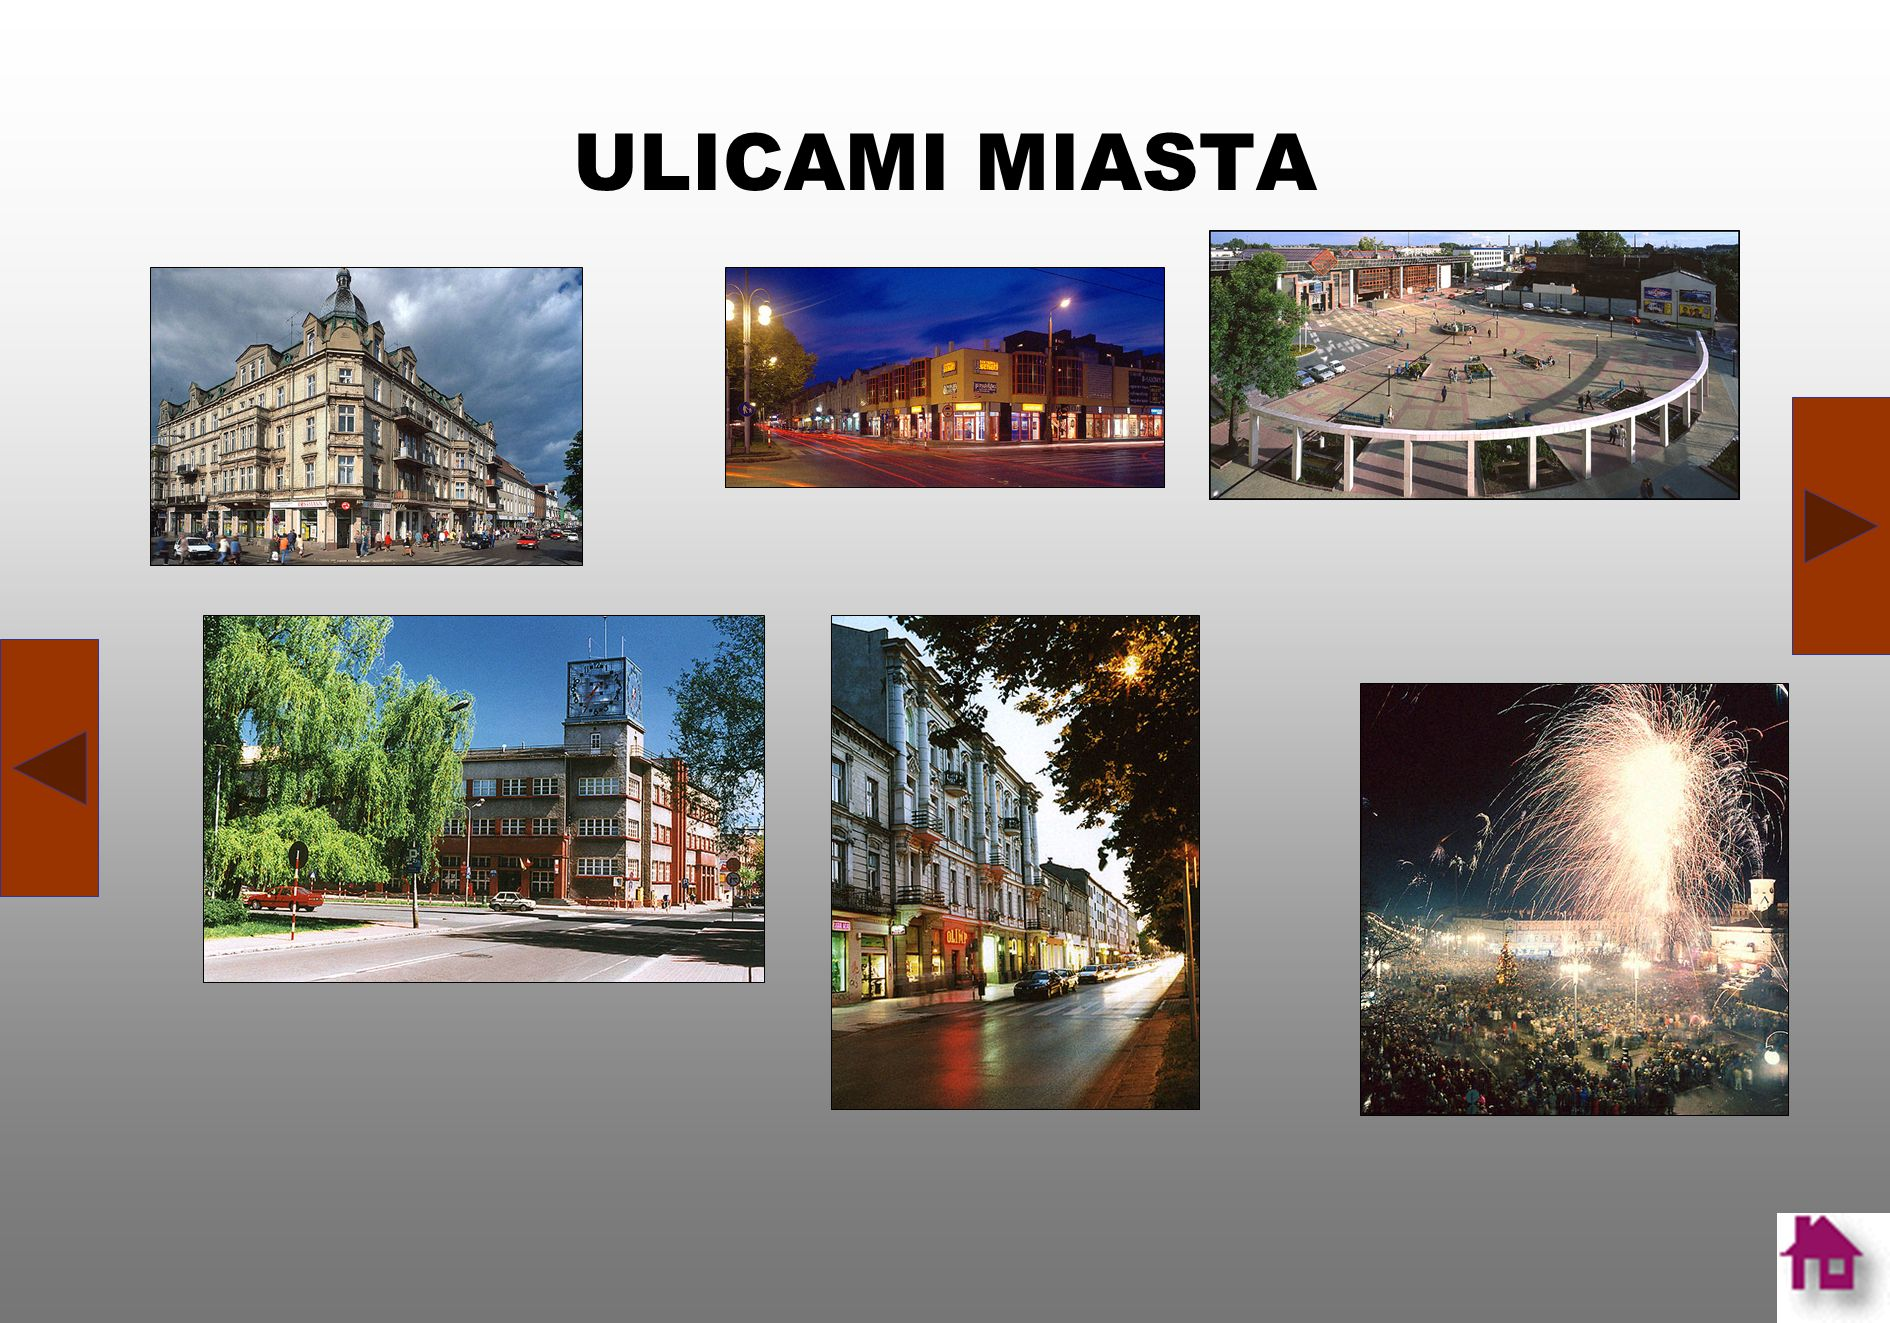 ULICAMI MIASTA